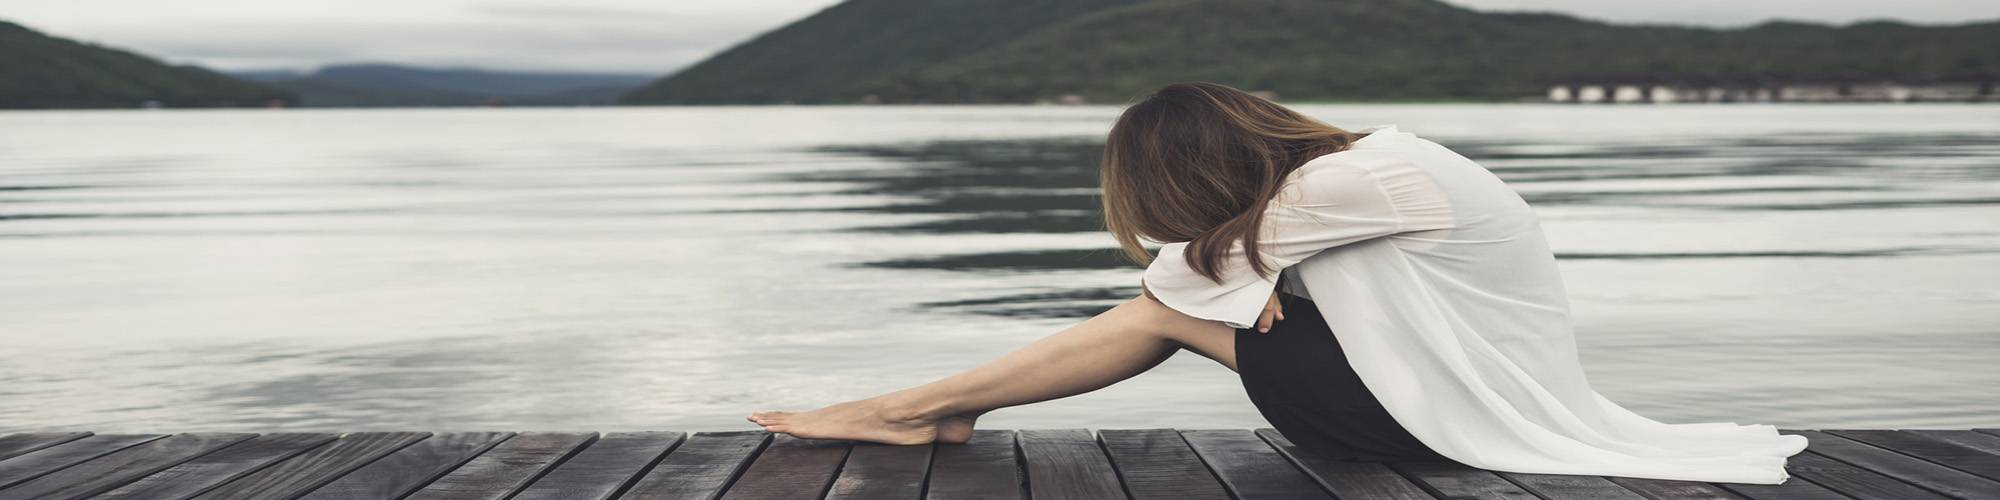 woman on jetty